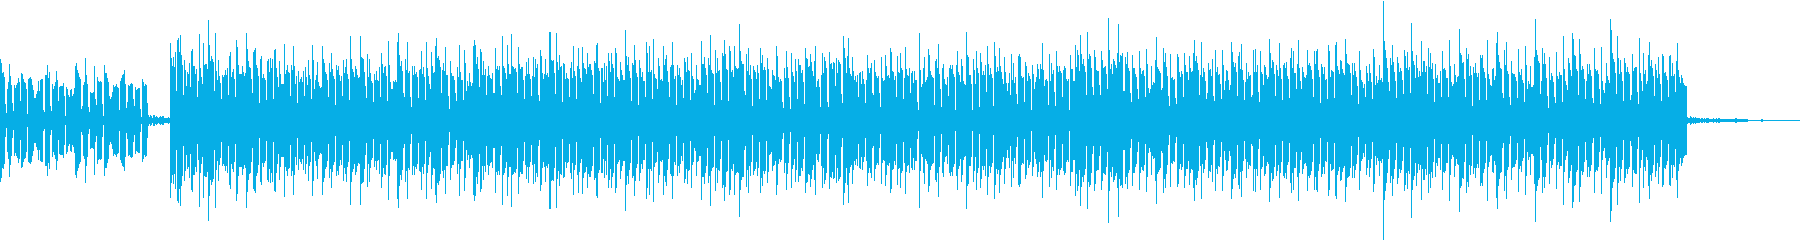 OP映像などに使えるエレクトロニカの再生済みの波形